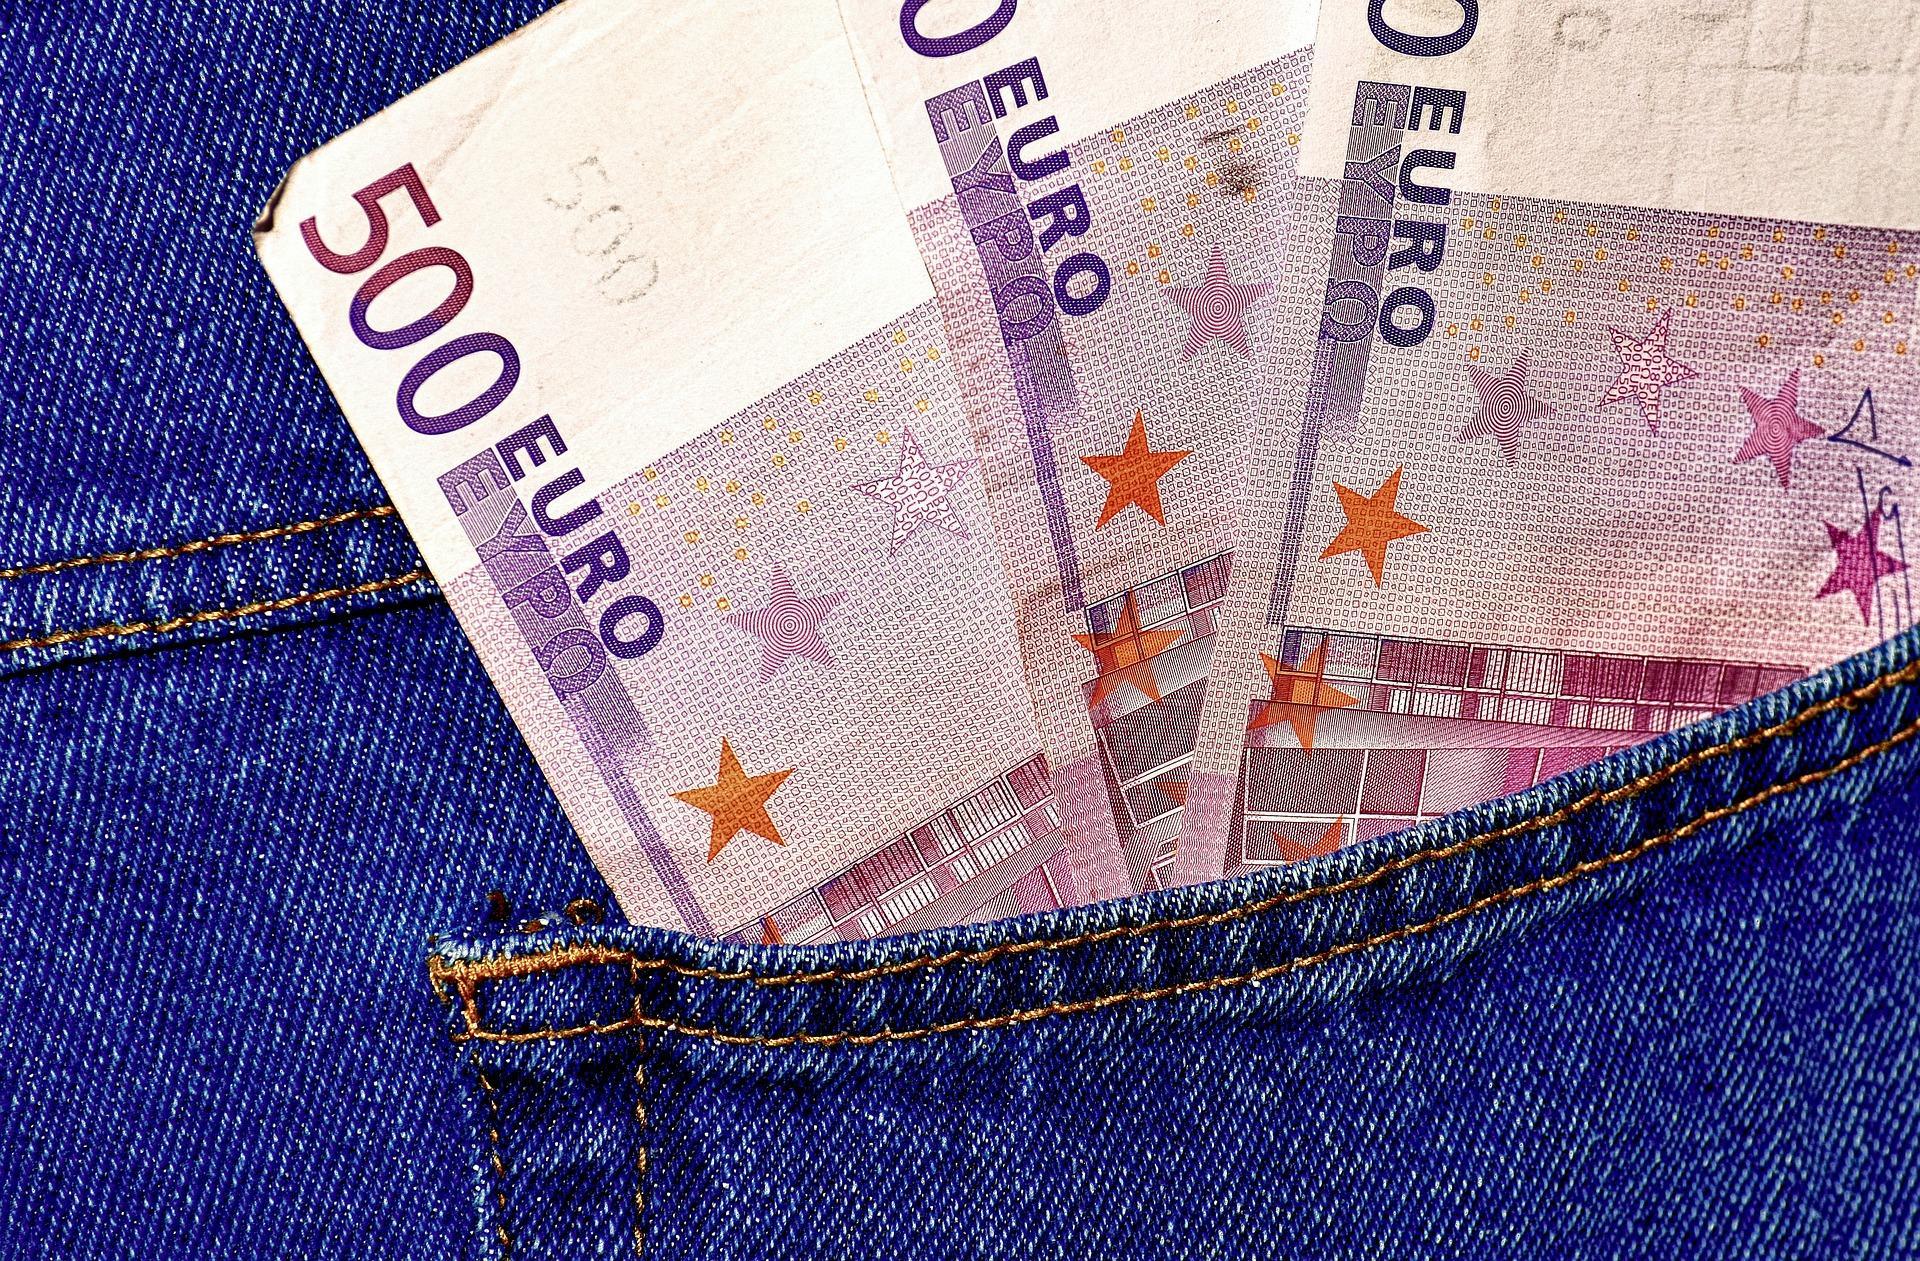 Aussetzung der Vollziehung eines Duldungsbescheids – und der Wegfall des Rechtsschutzinteresses